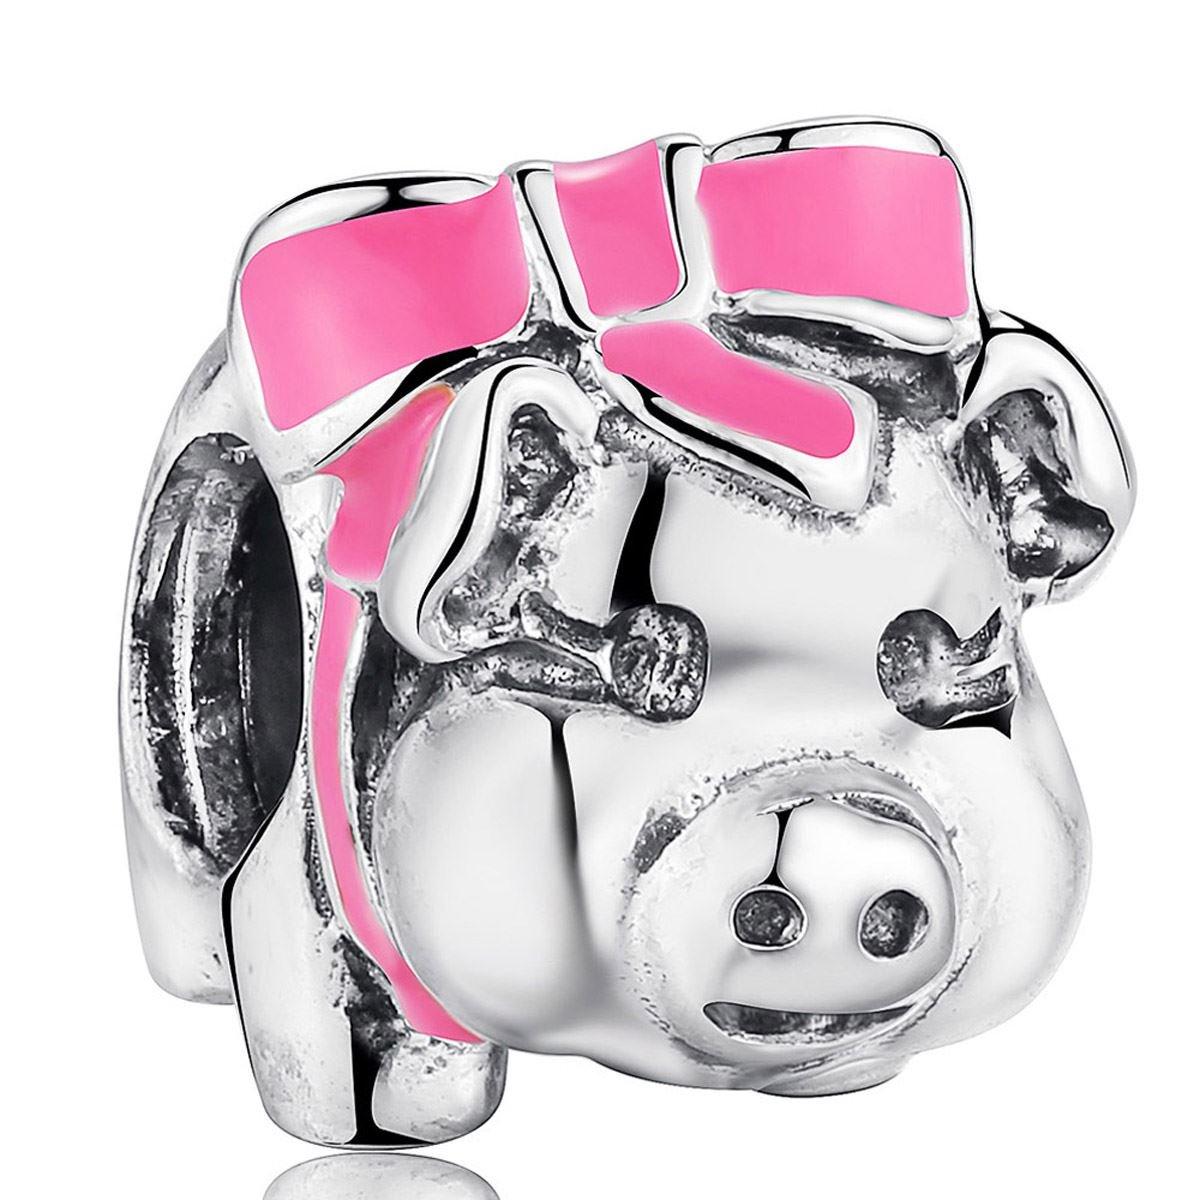 925 Sterling Silver Charms Pink Enamel Piggy Bank European Charm Fit Snake Chain Bracelet Fine Jewelry Making